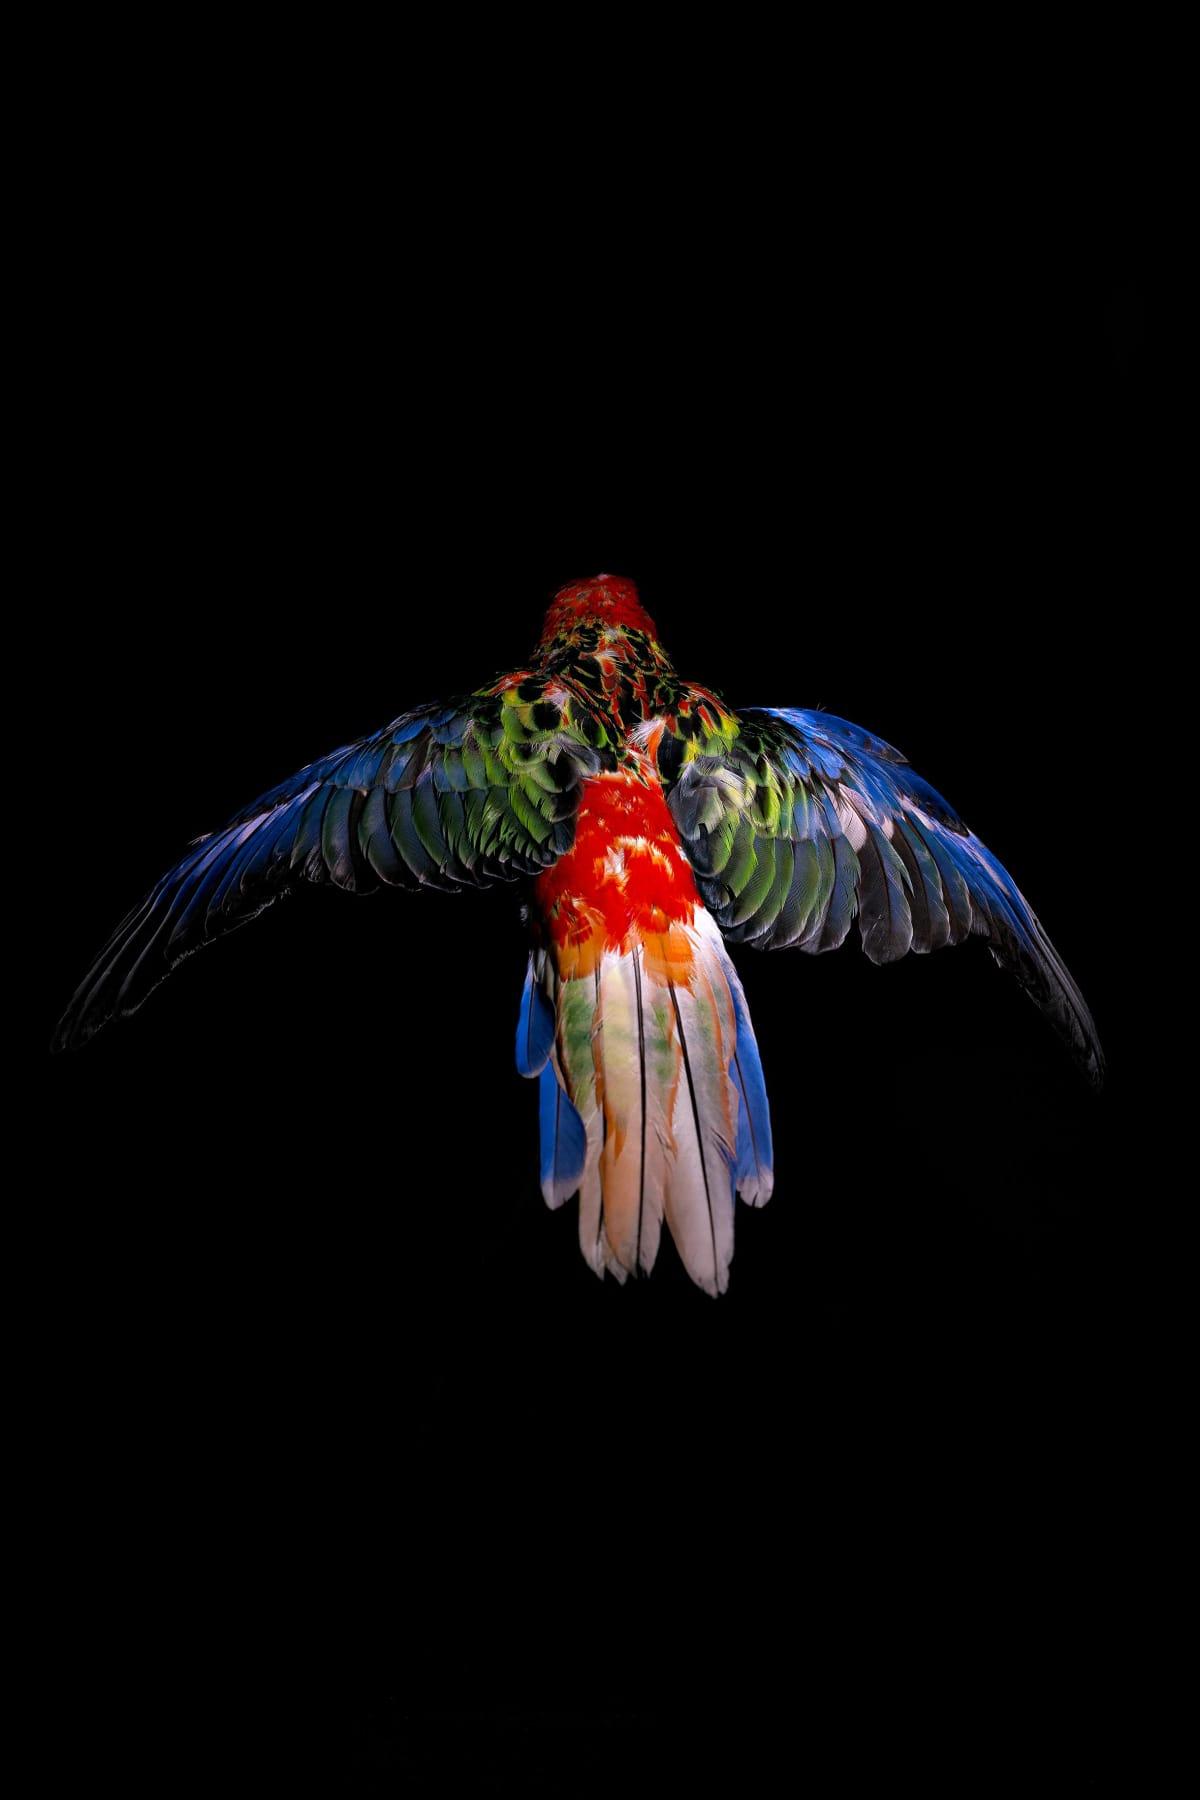 Lucas Lenci, Oiseau 3, 2015 - 2019